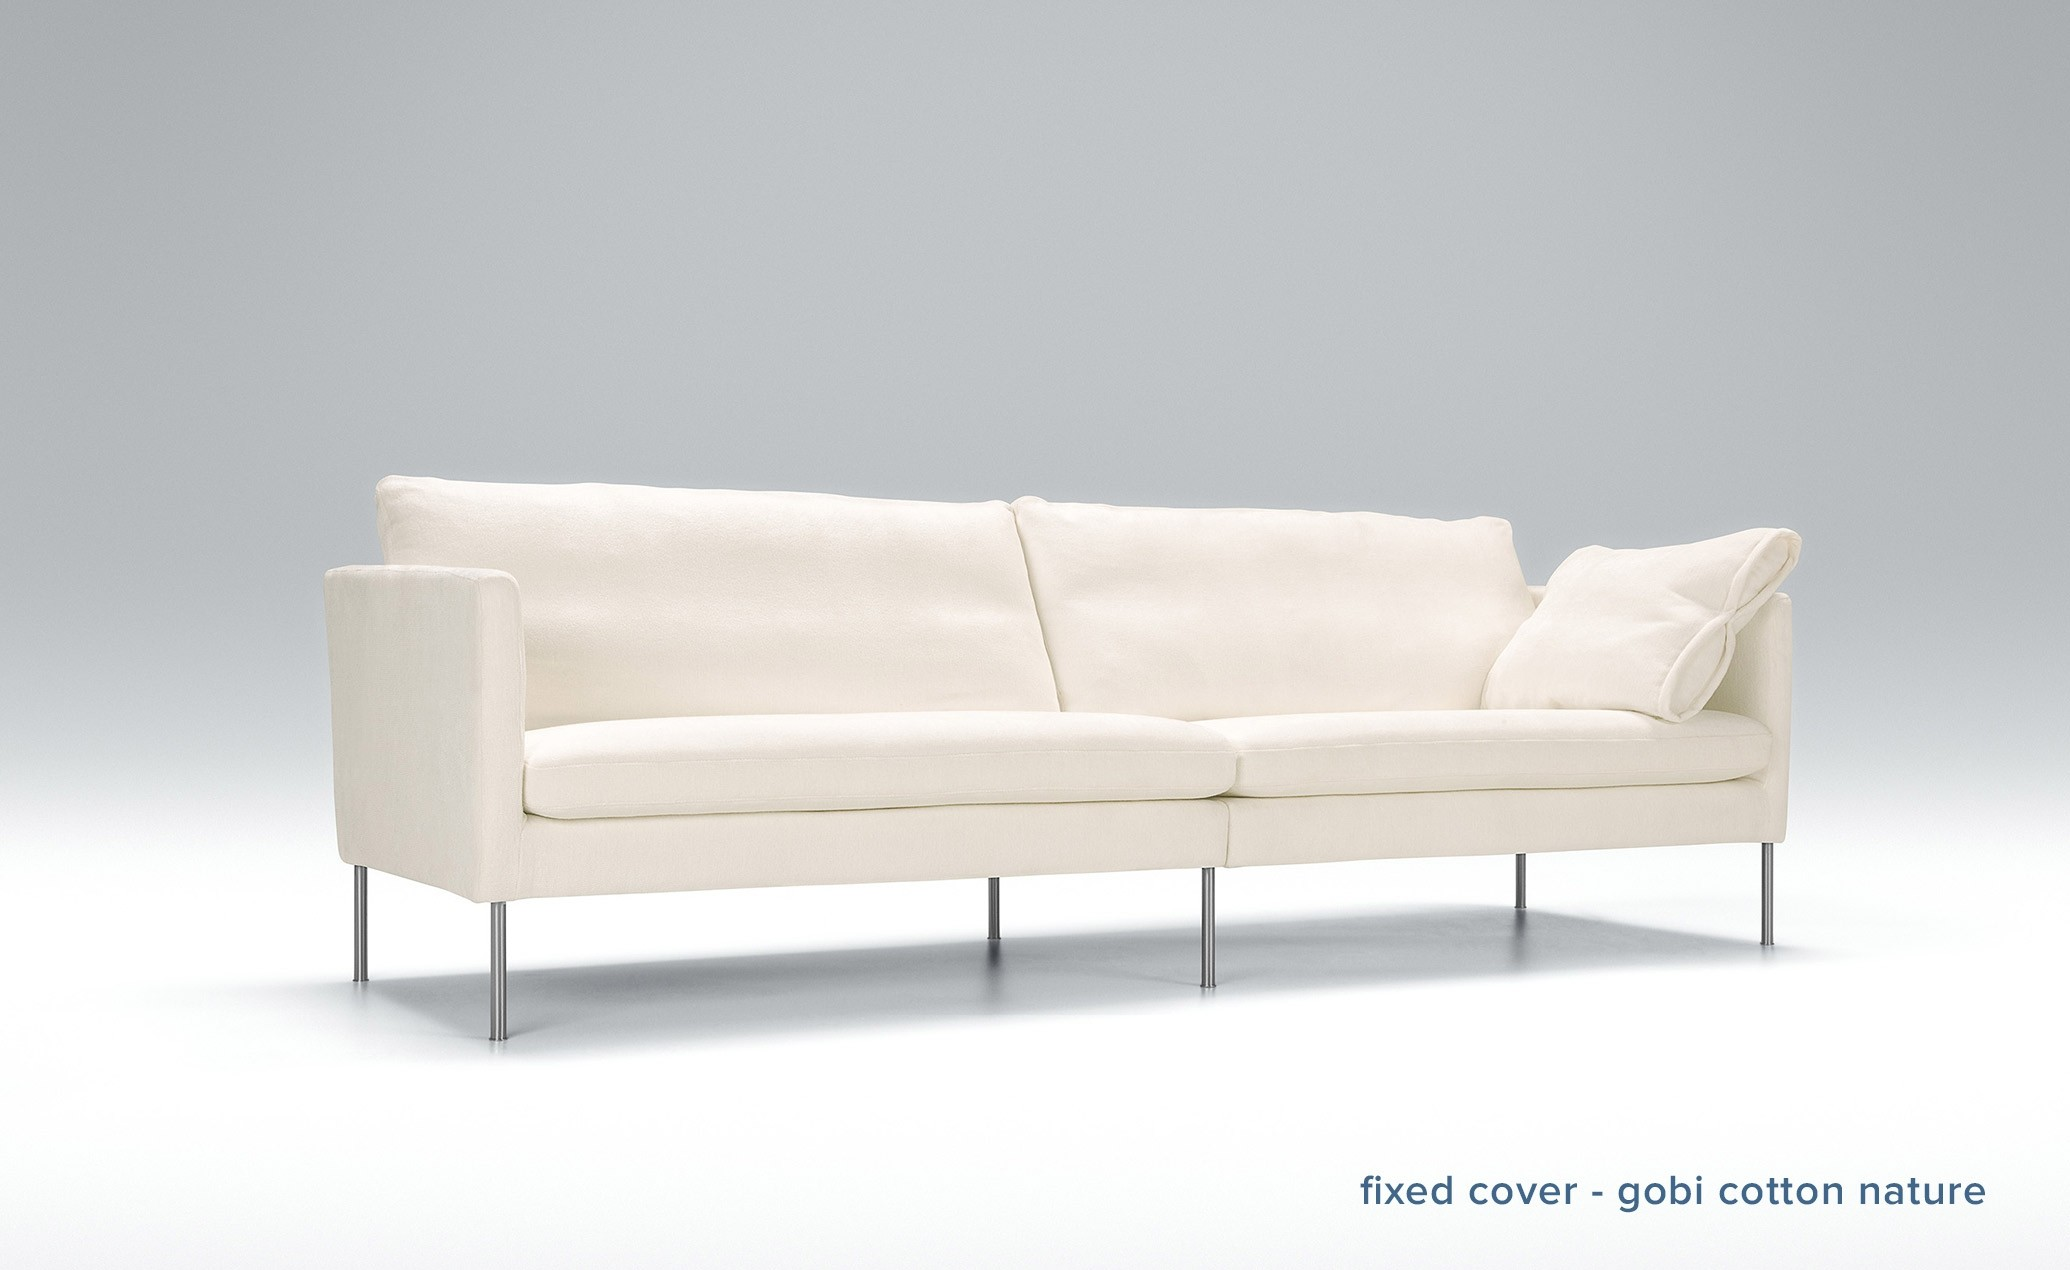 Bliss 4 seater sofa - set 1